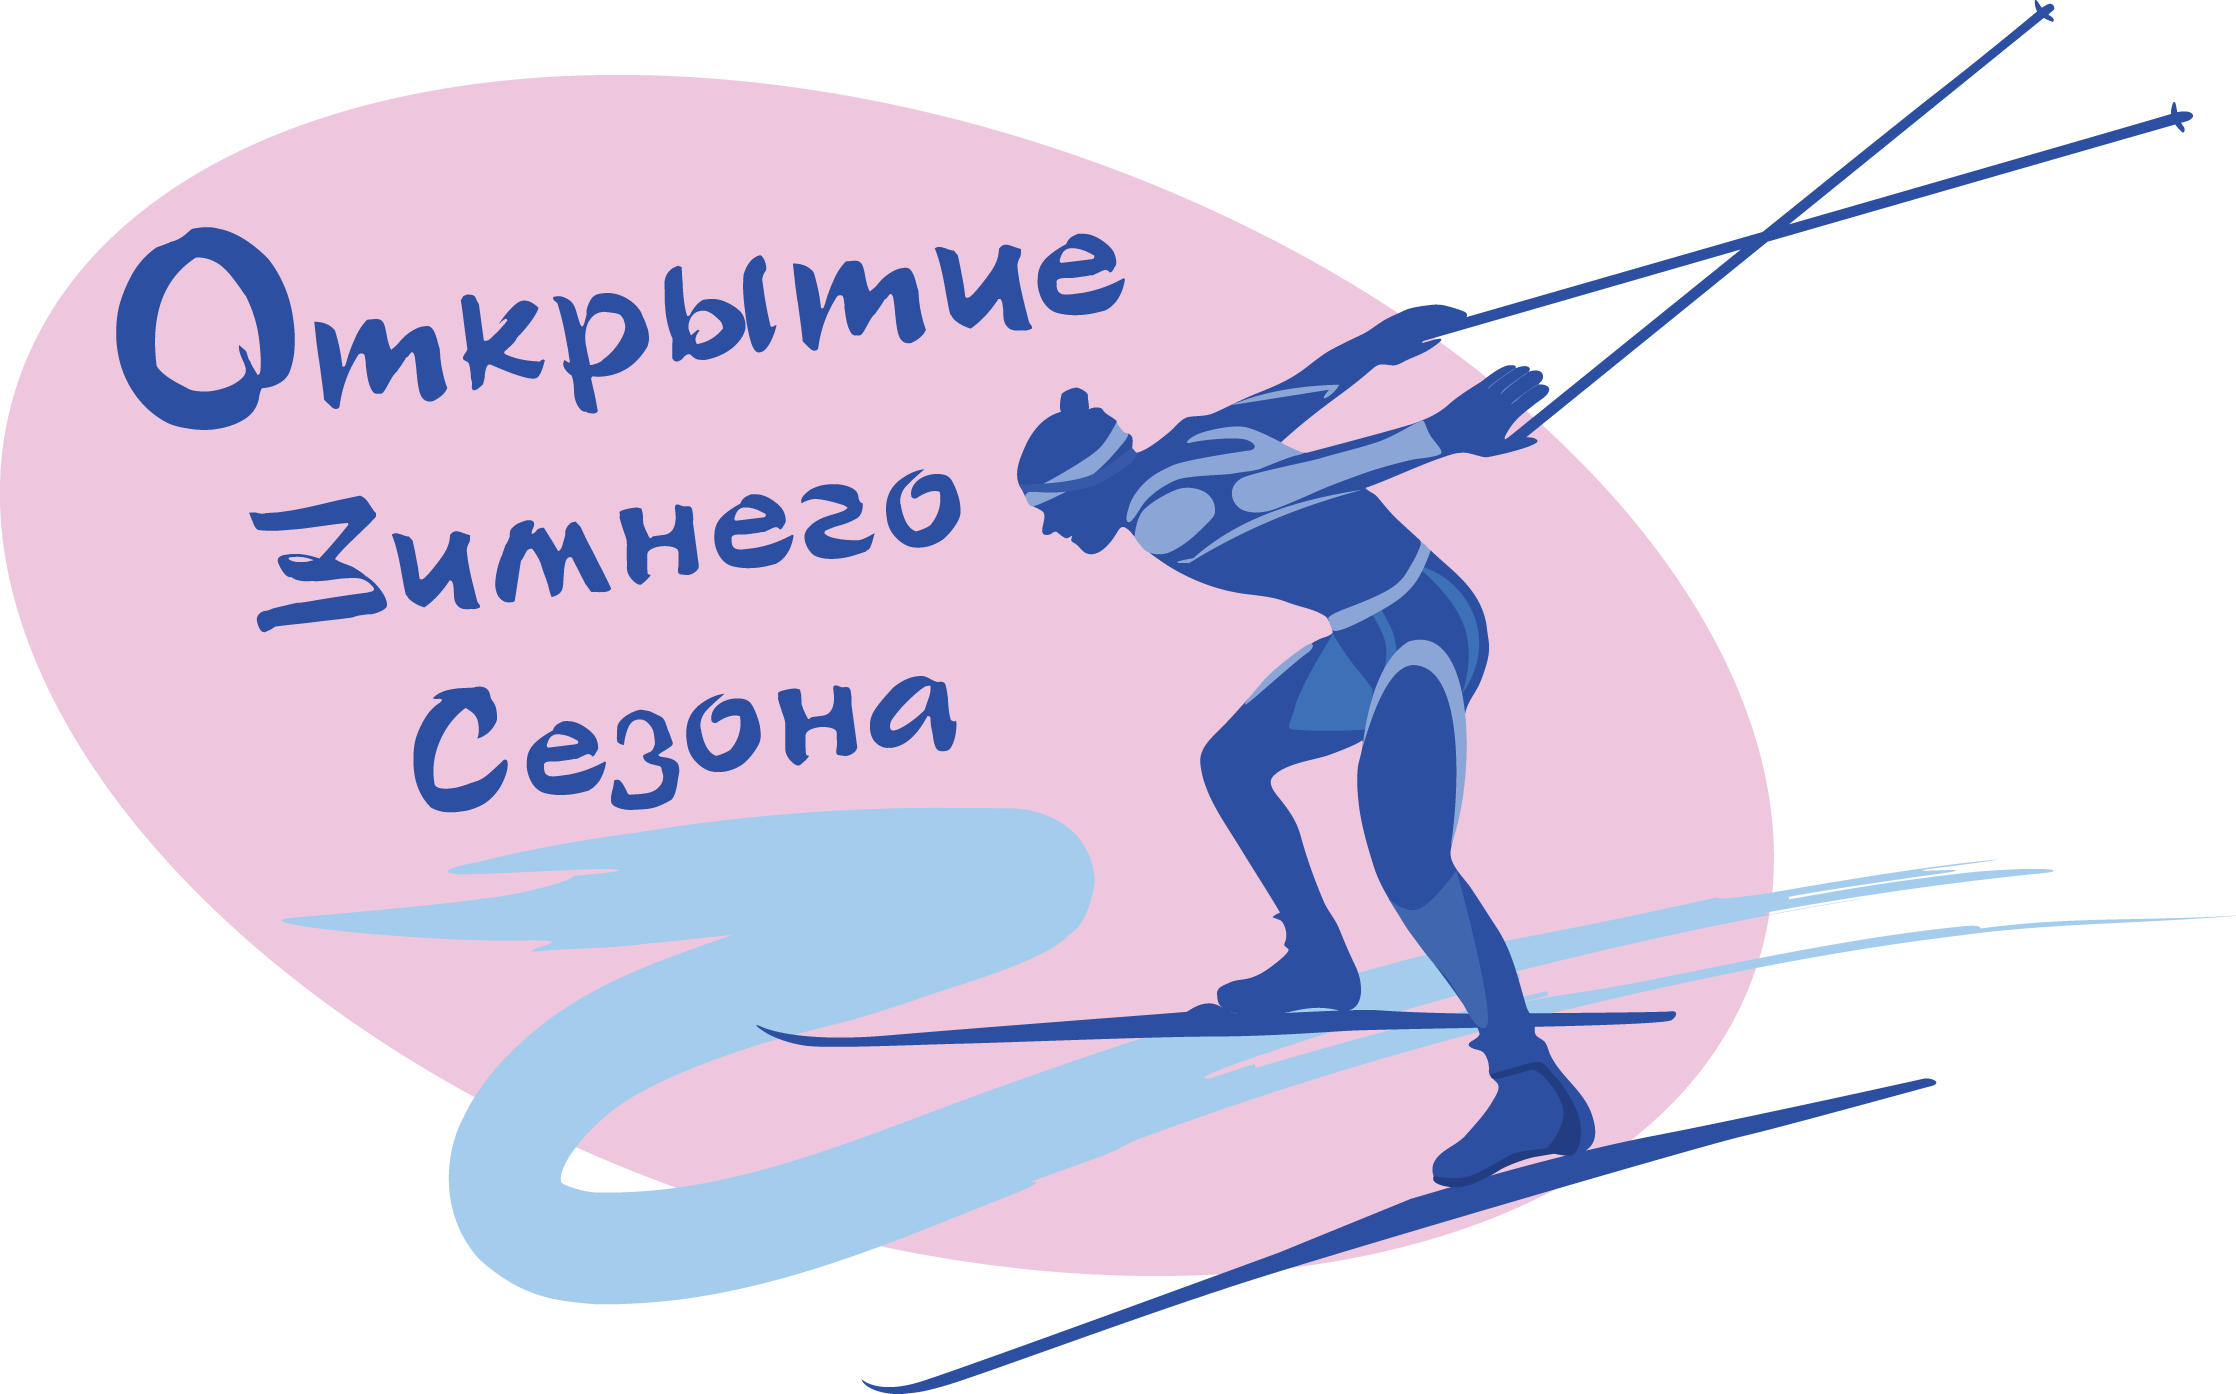 http://www.spadm.ru/upload/iblock/9f8/otkry_tie_zimnego_sezona.png